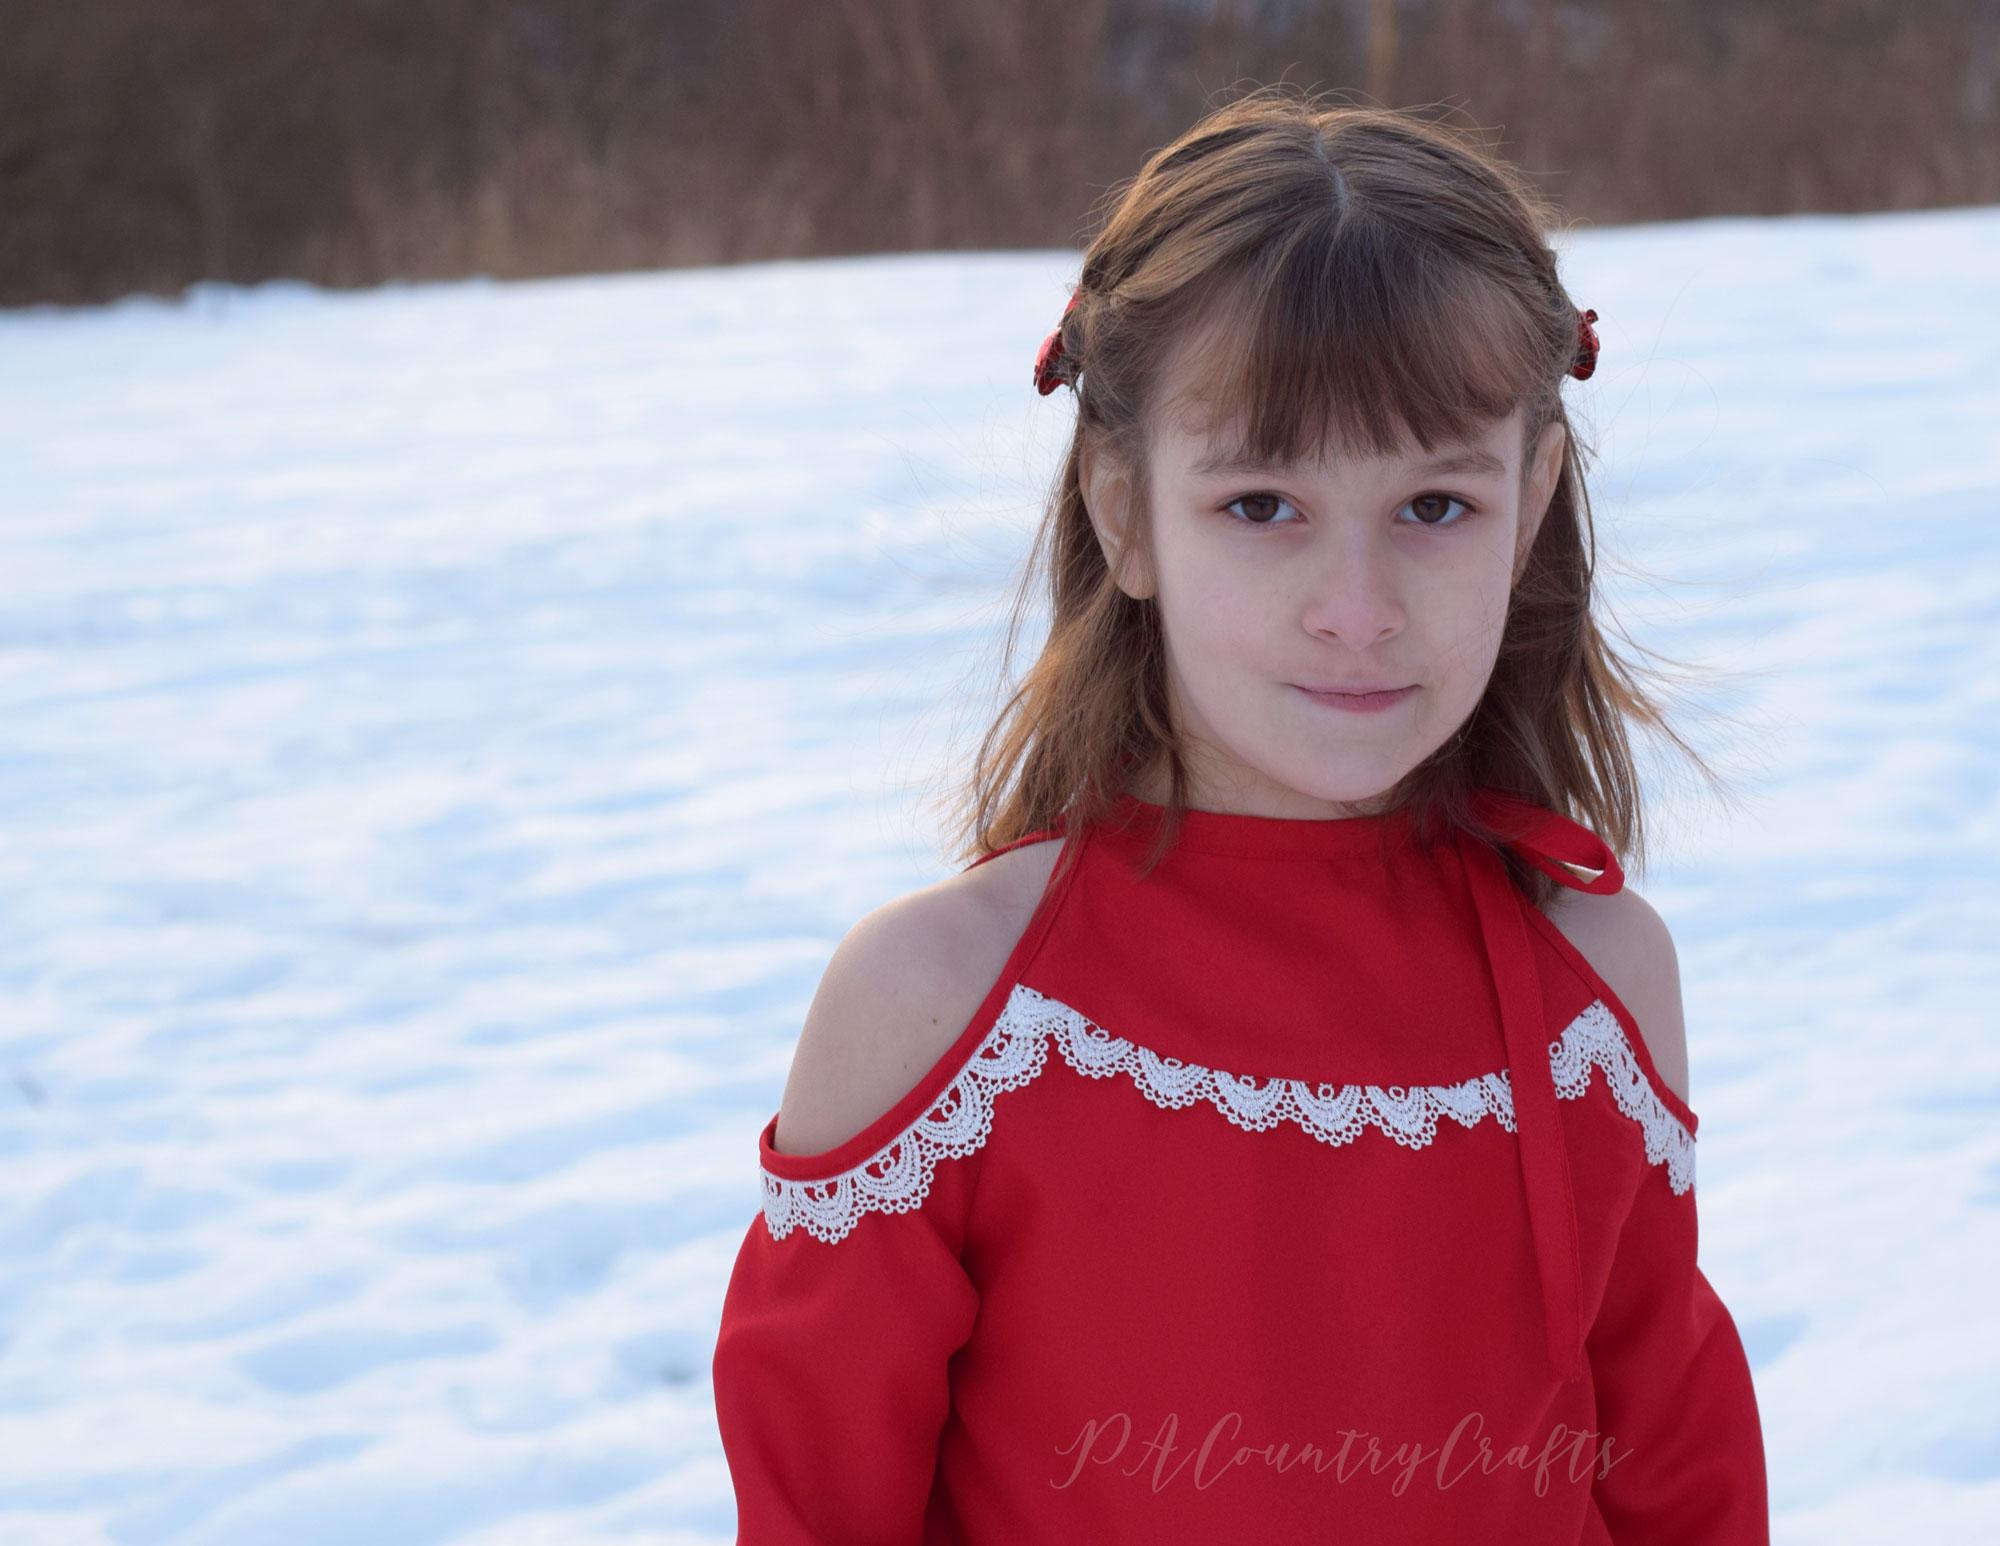 Girls cold shoulder top for winter in red crepe satin!